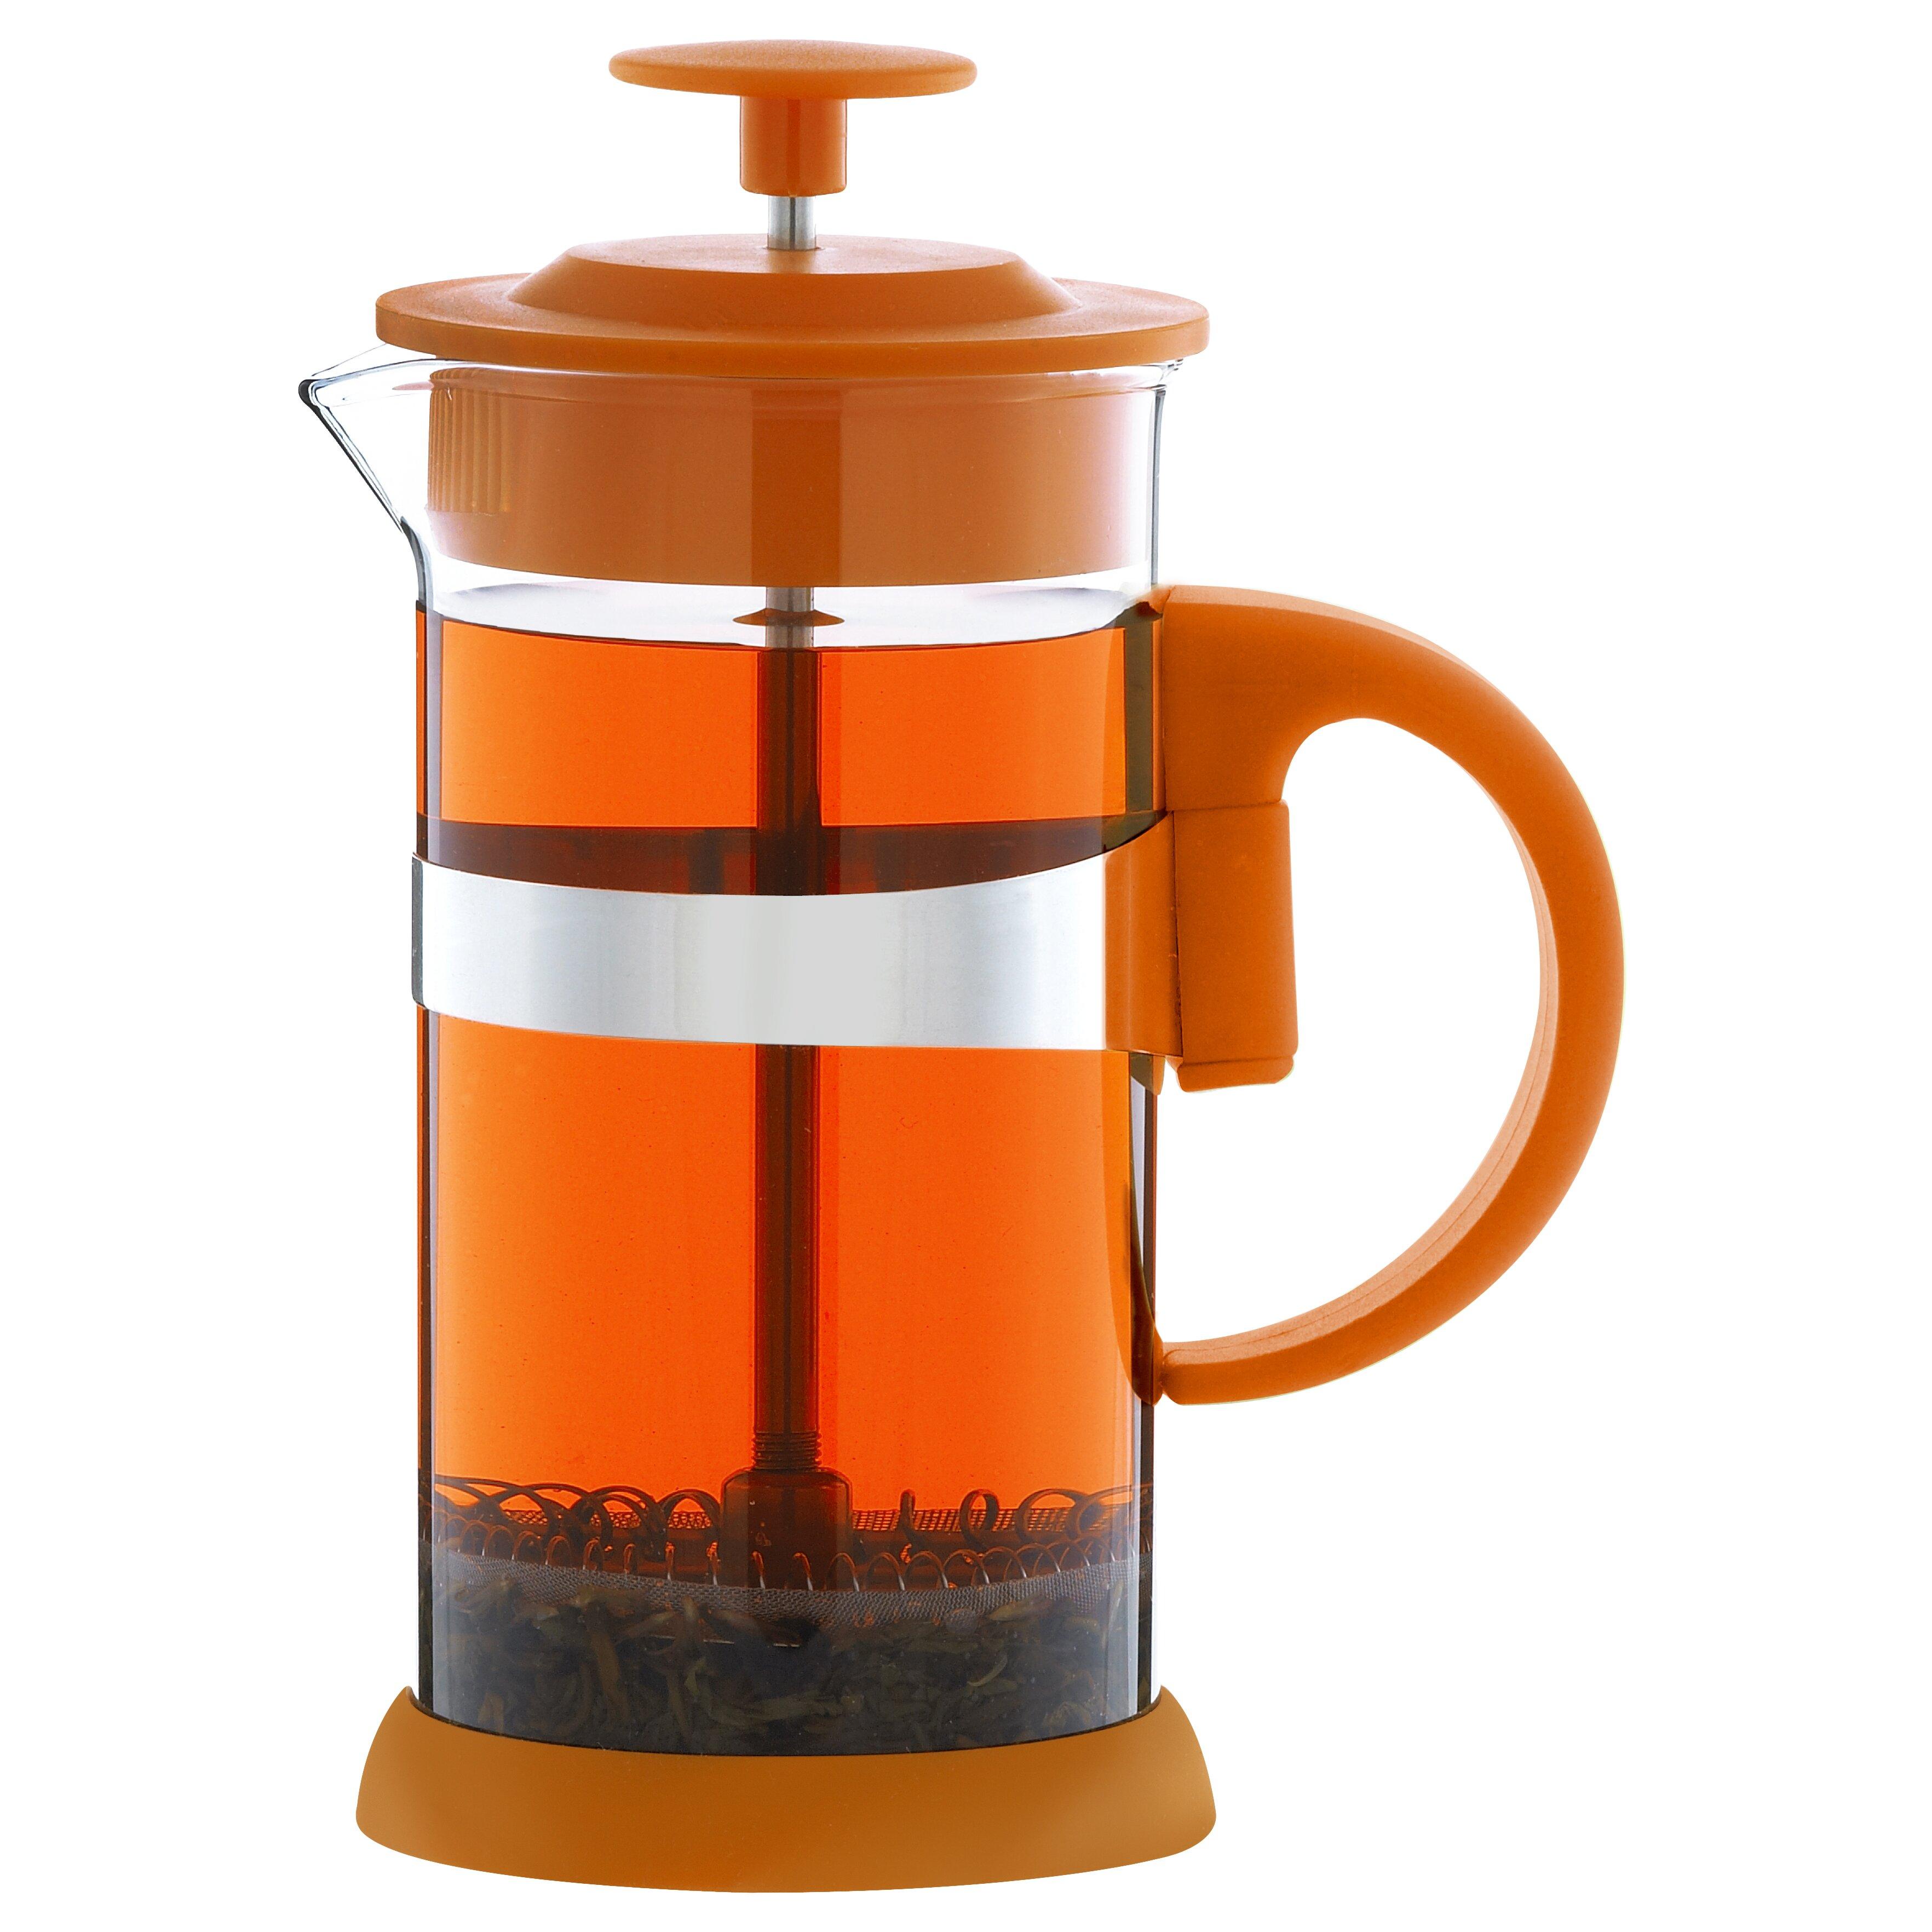 grosche international zurich french press coffee maker reviews wayfair. Black Bedroom Furniture Sets. Home Design Ideas